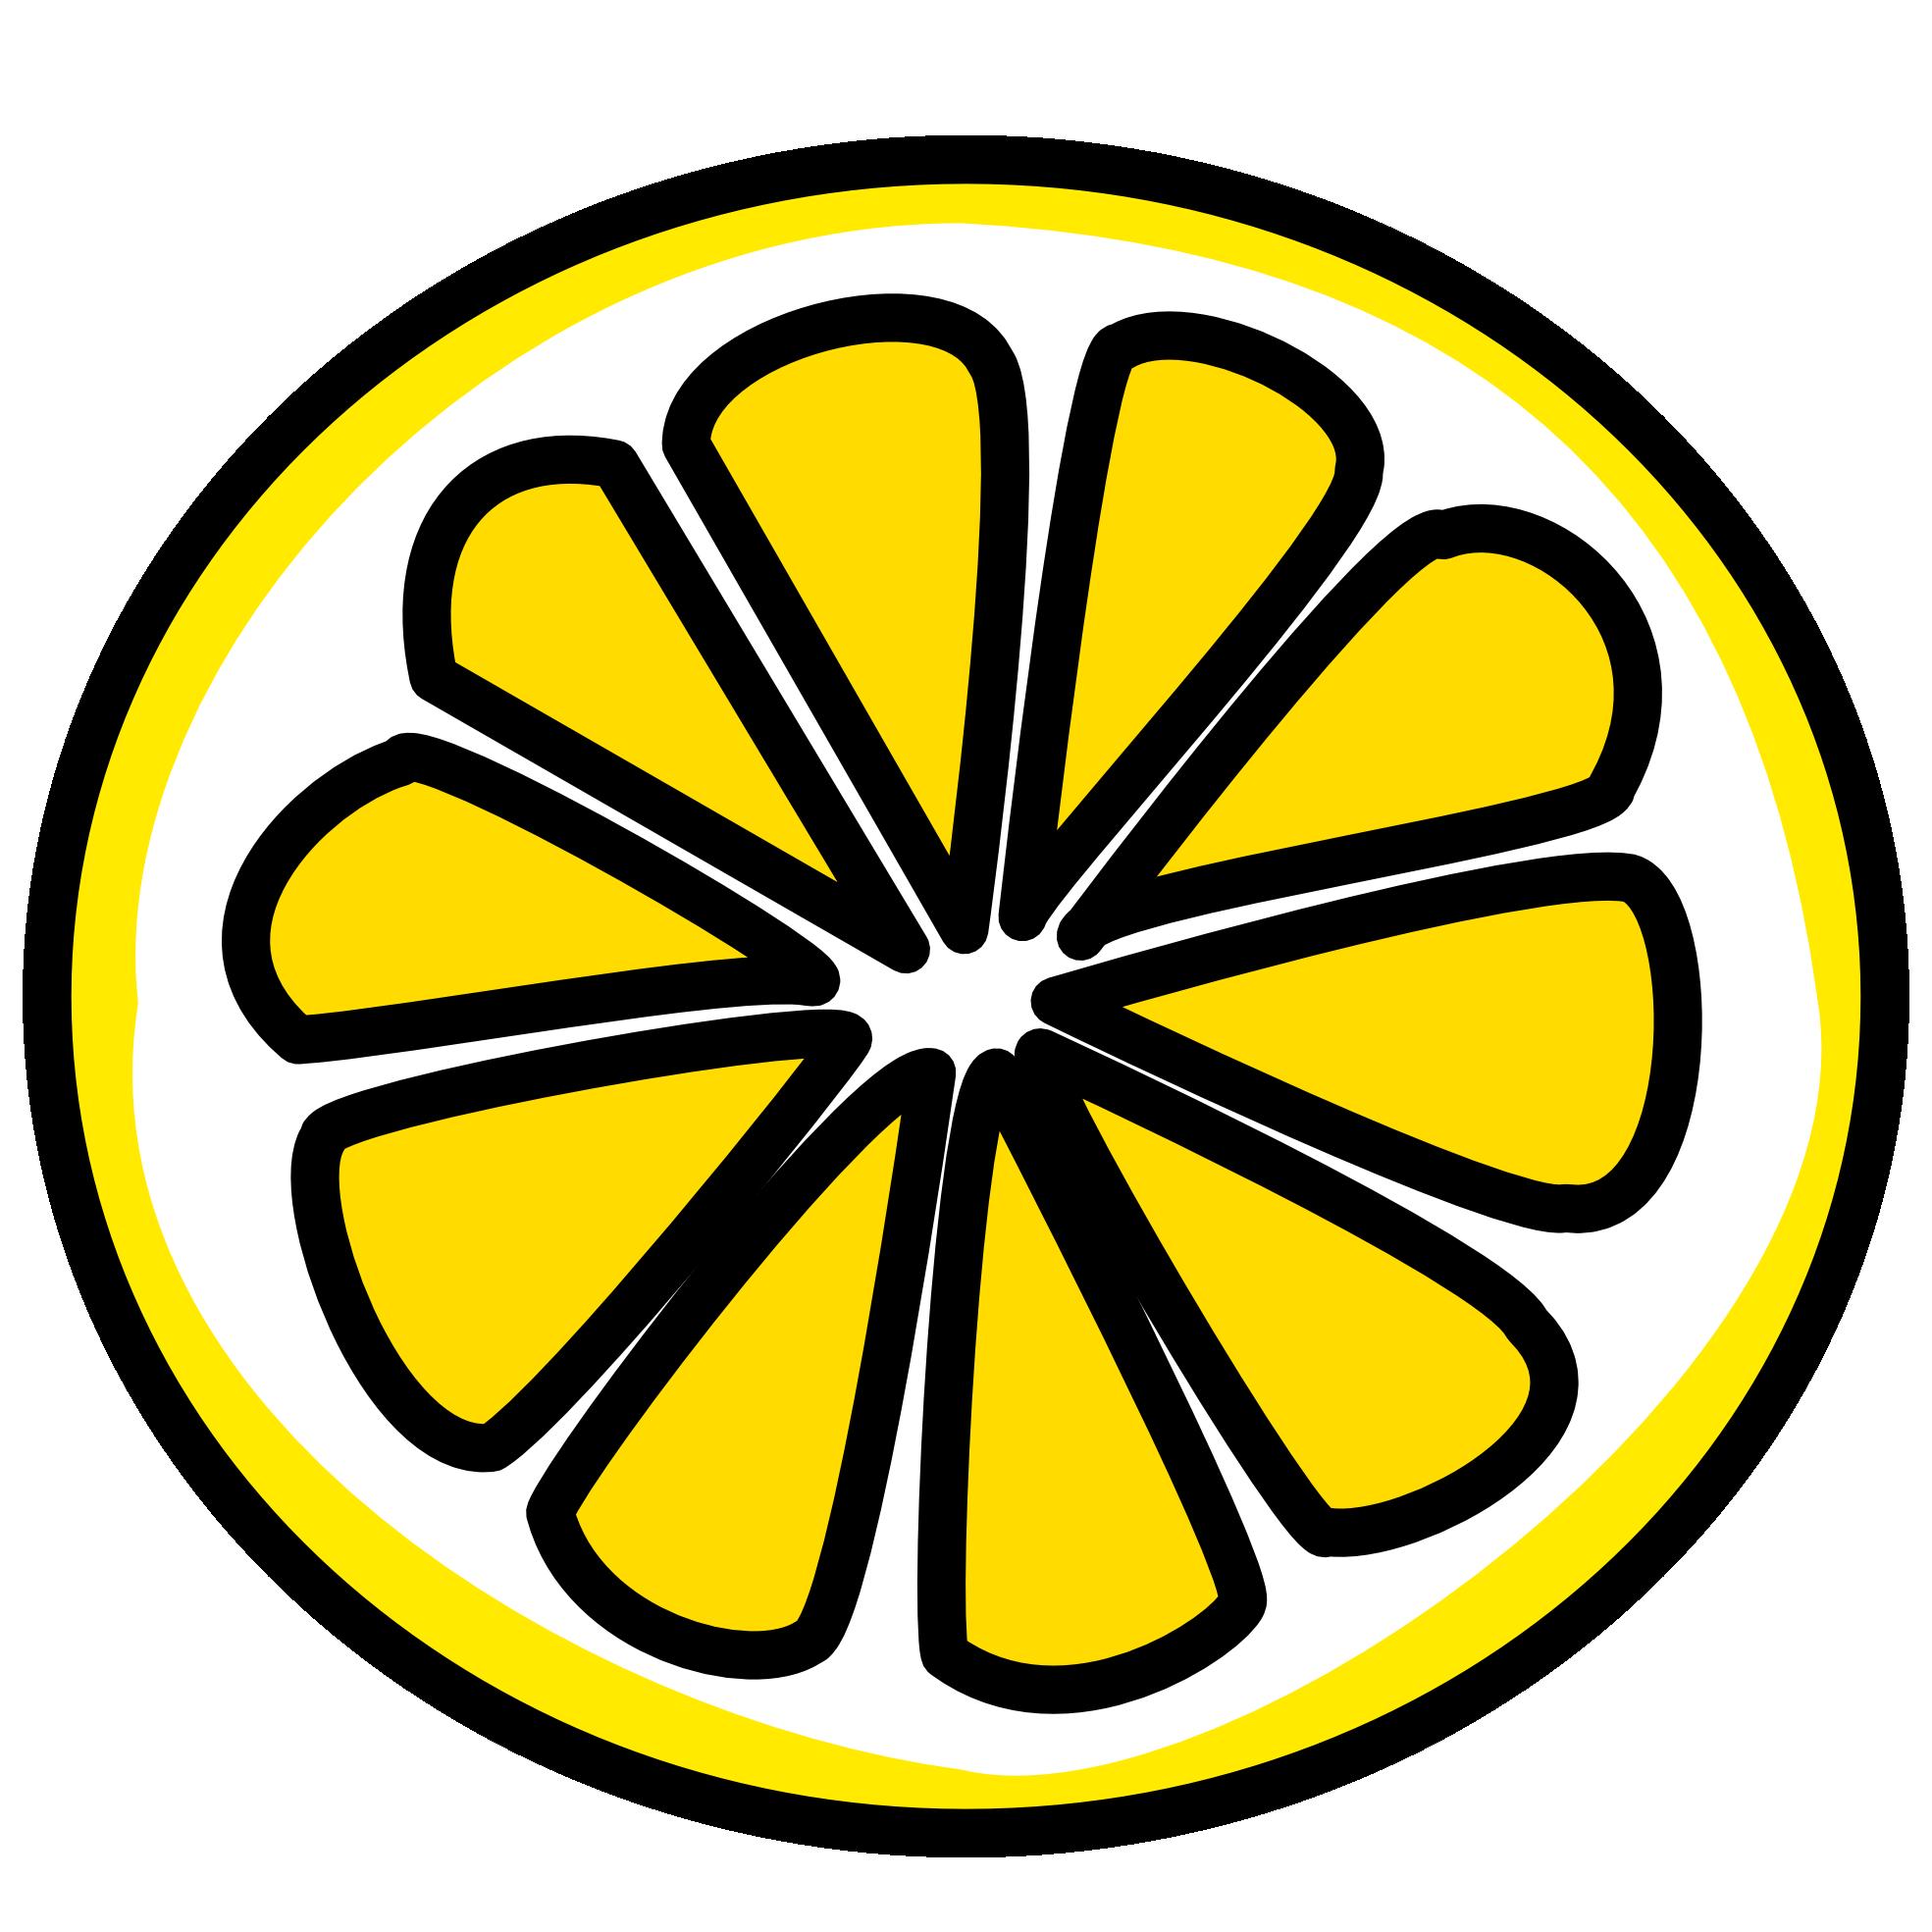 png royalty free download Lemon Slice Paintings Clipart